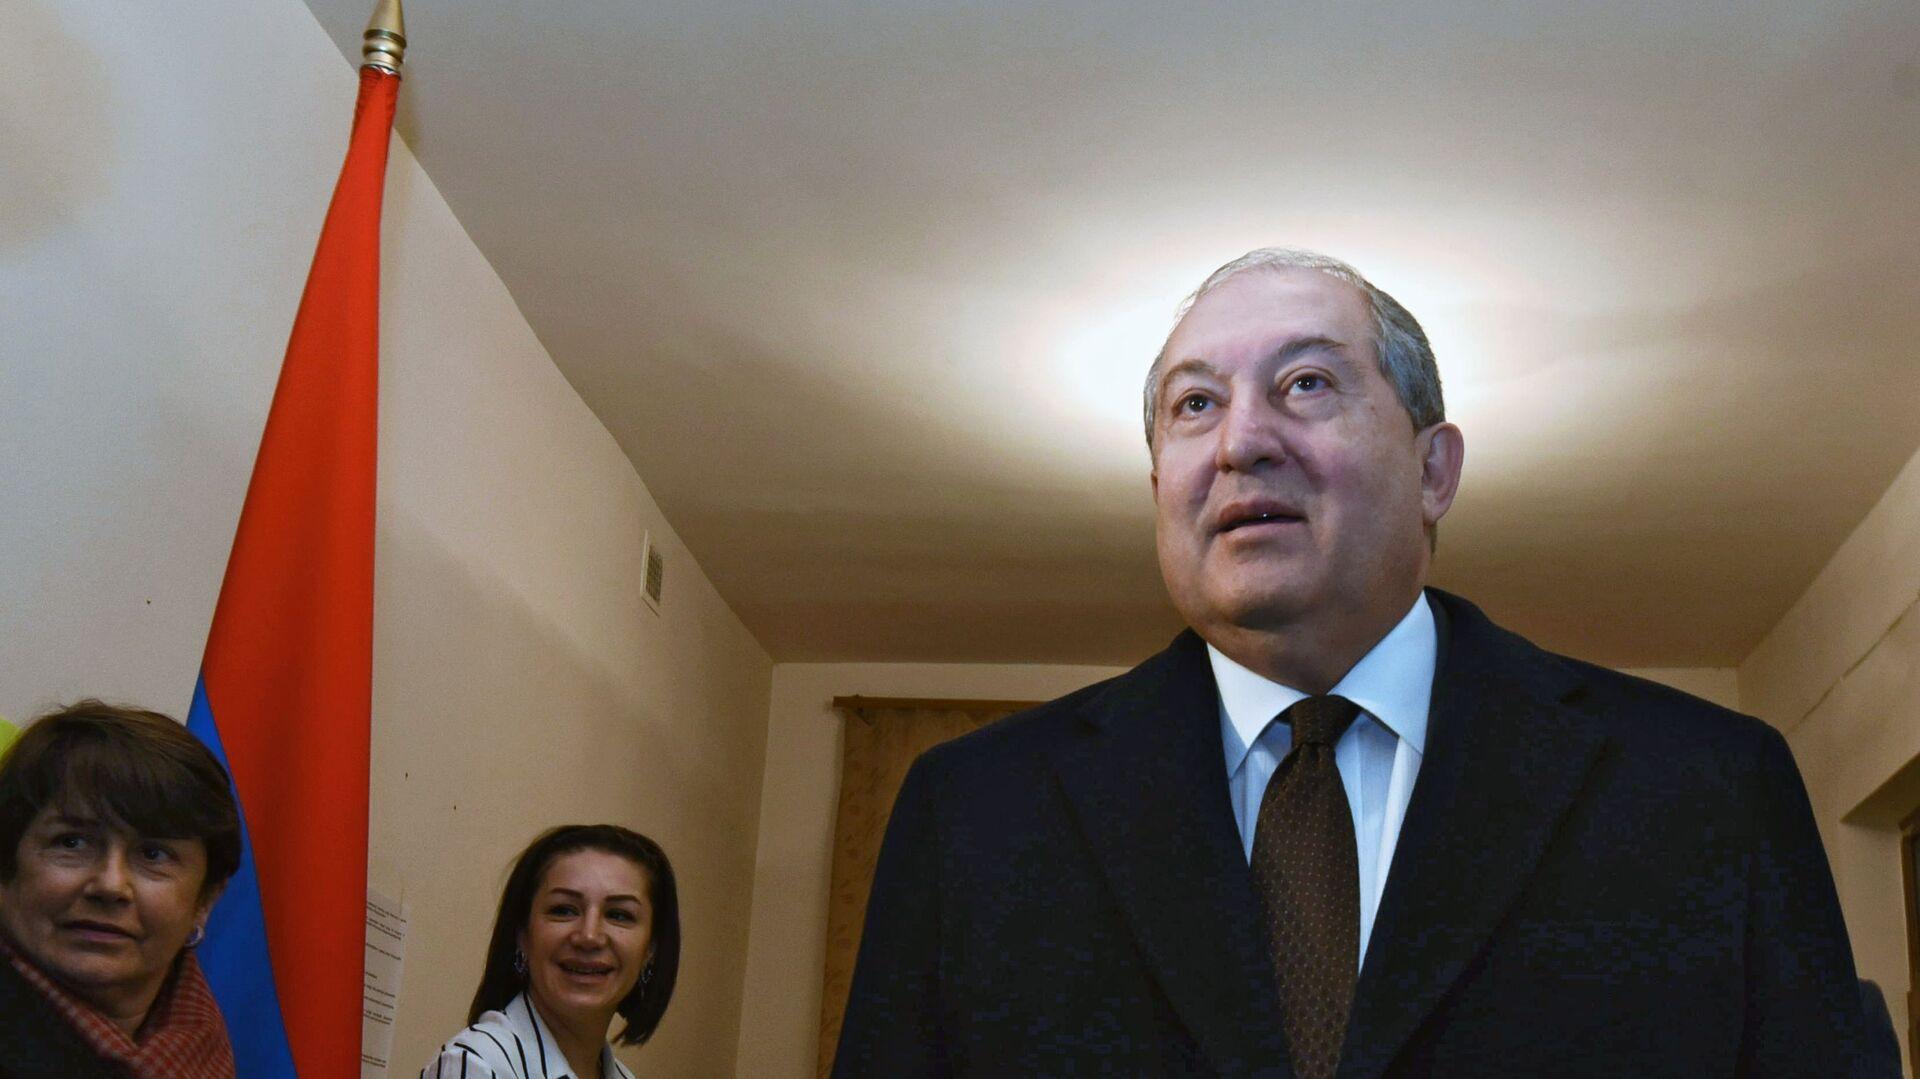 Armén Sarkisián, el presidente de Armenia - Sputnik Mundo, 1920, 04.03.2021